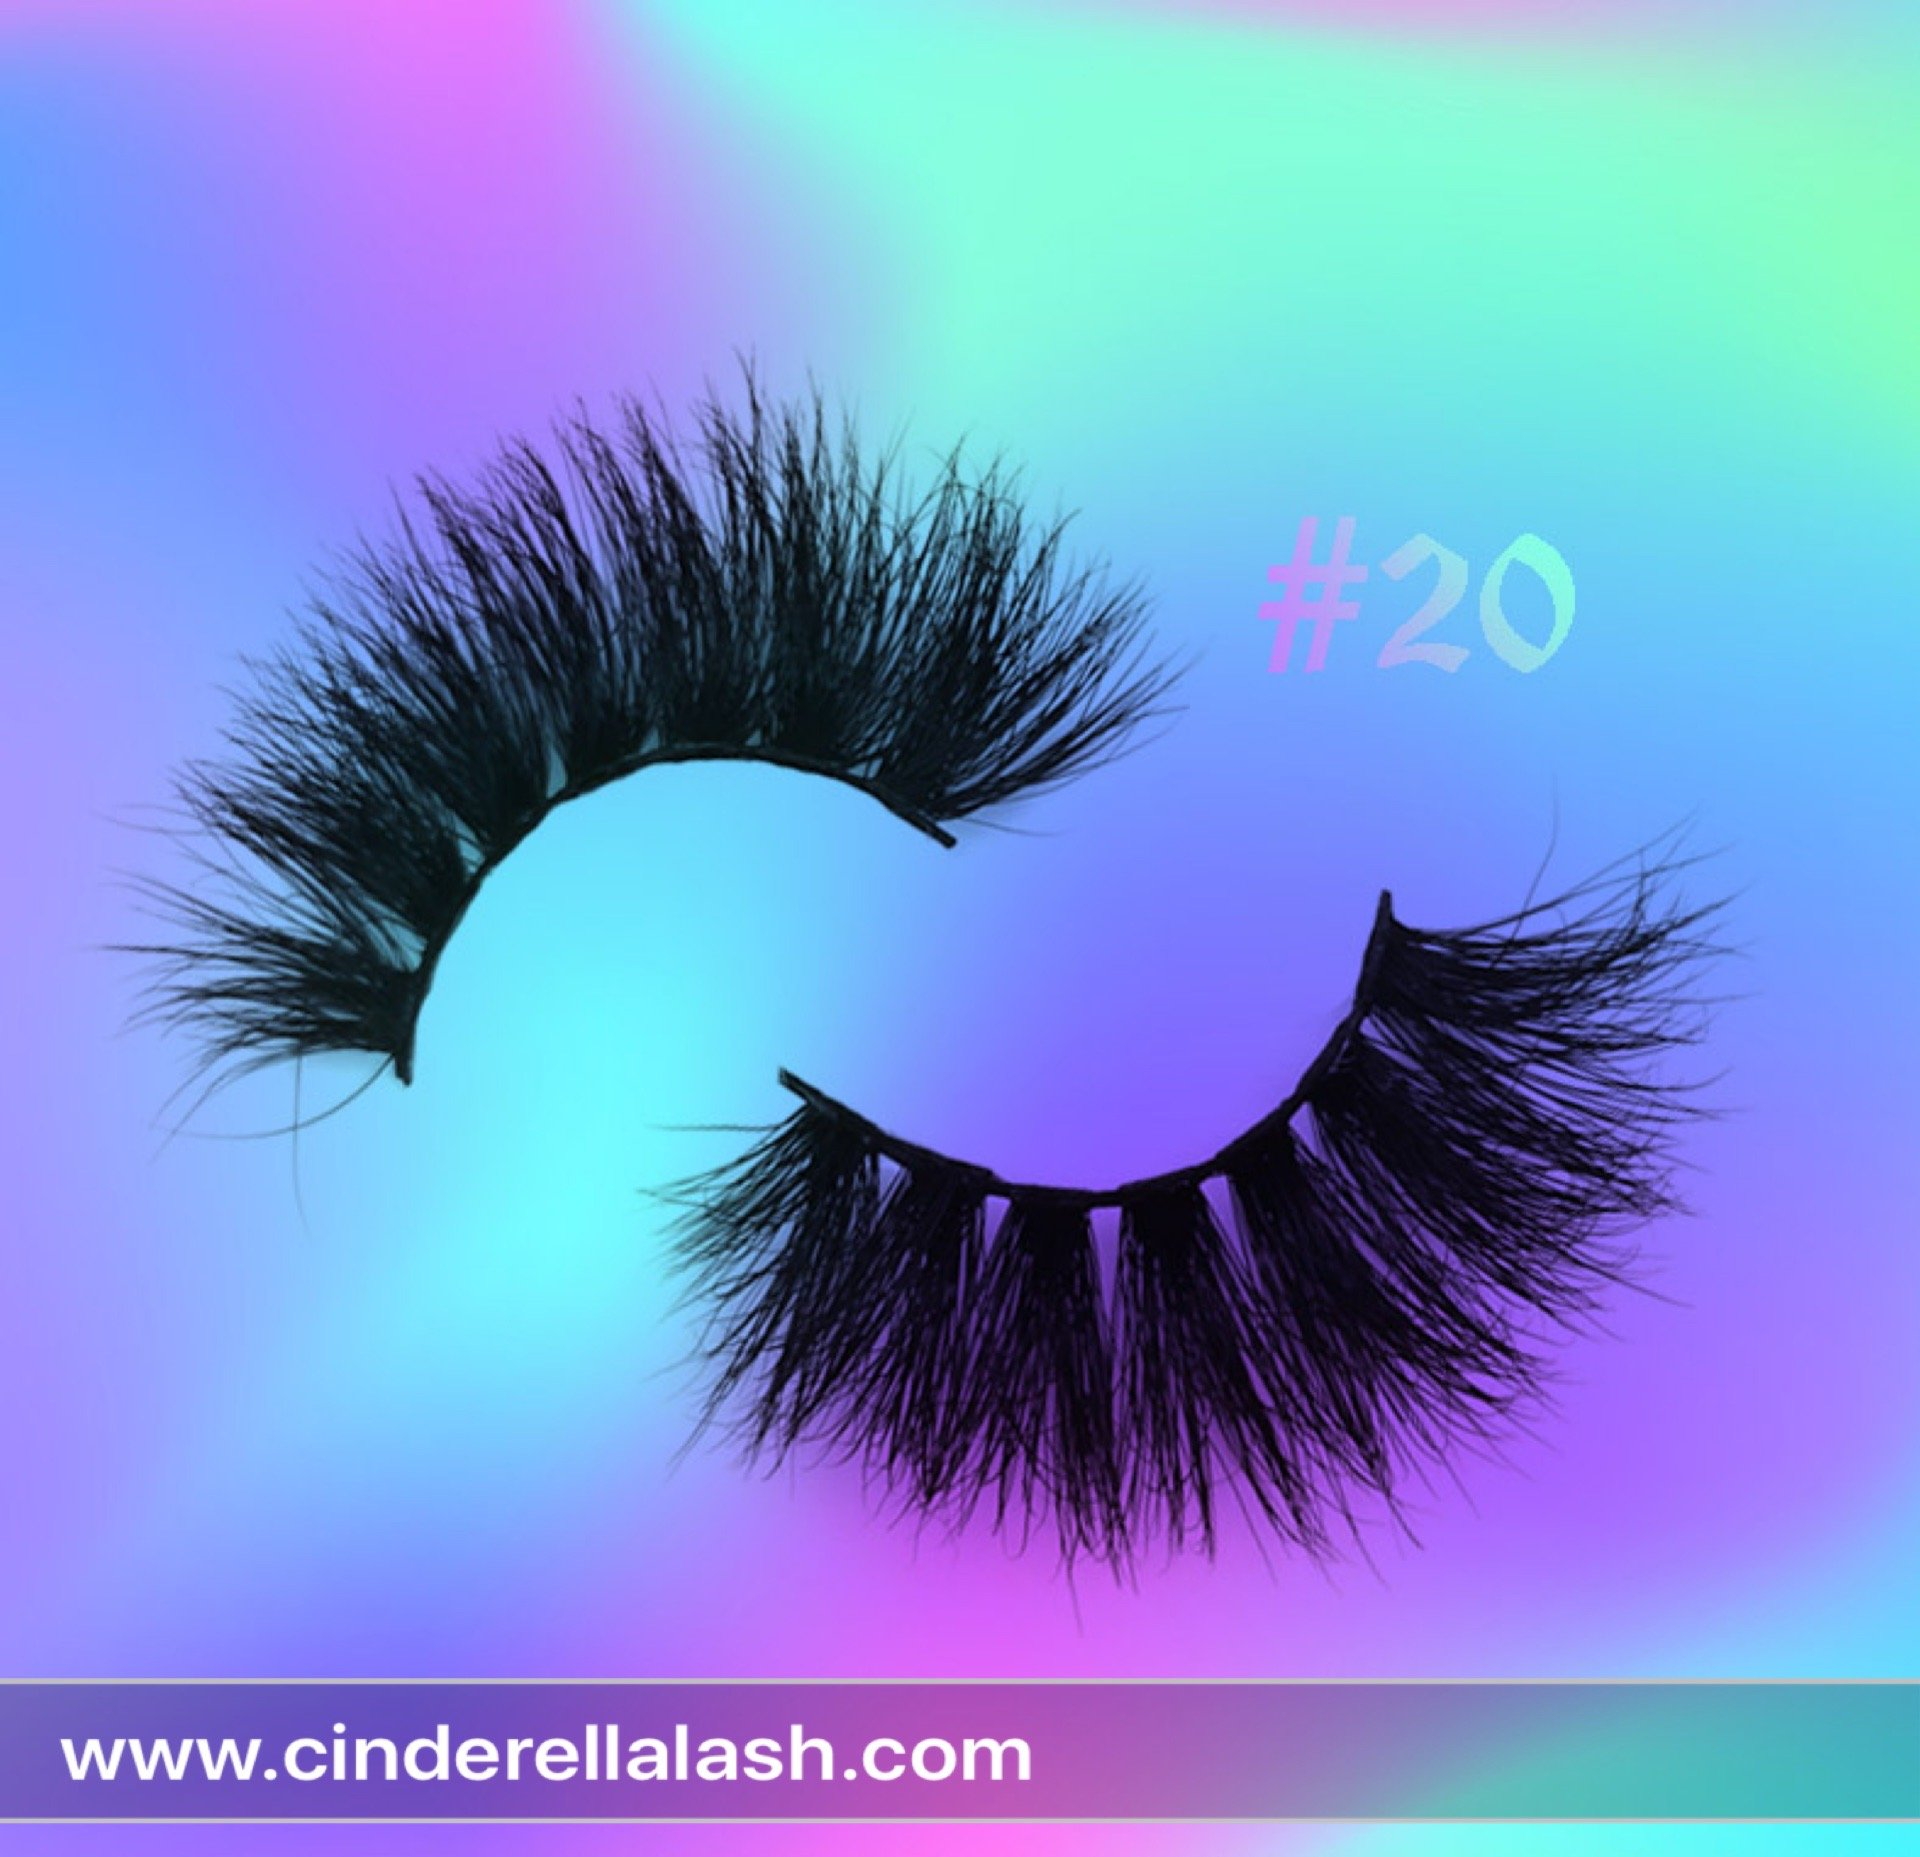 Cinderella best eyelash extensions company